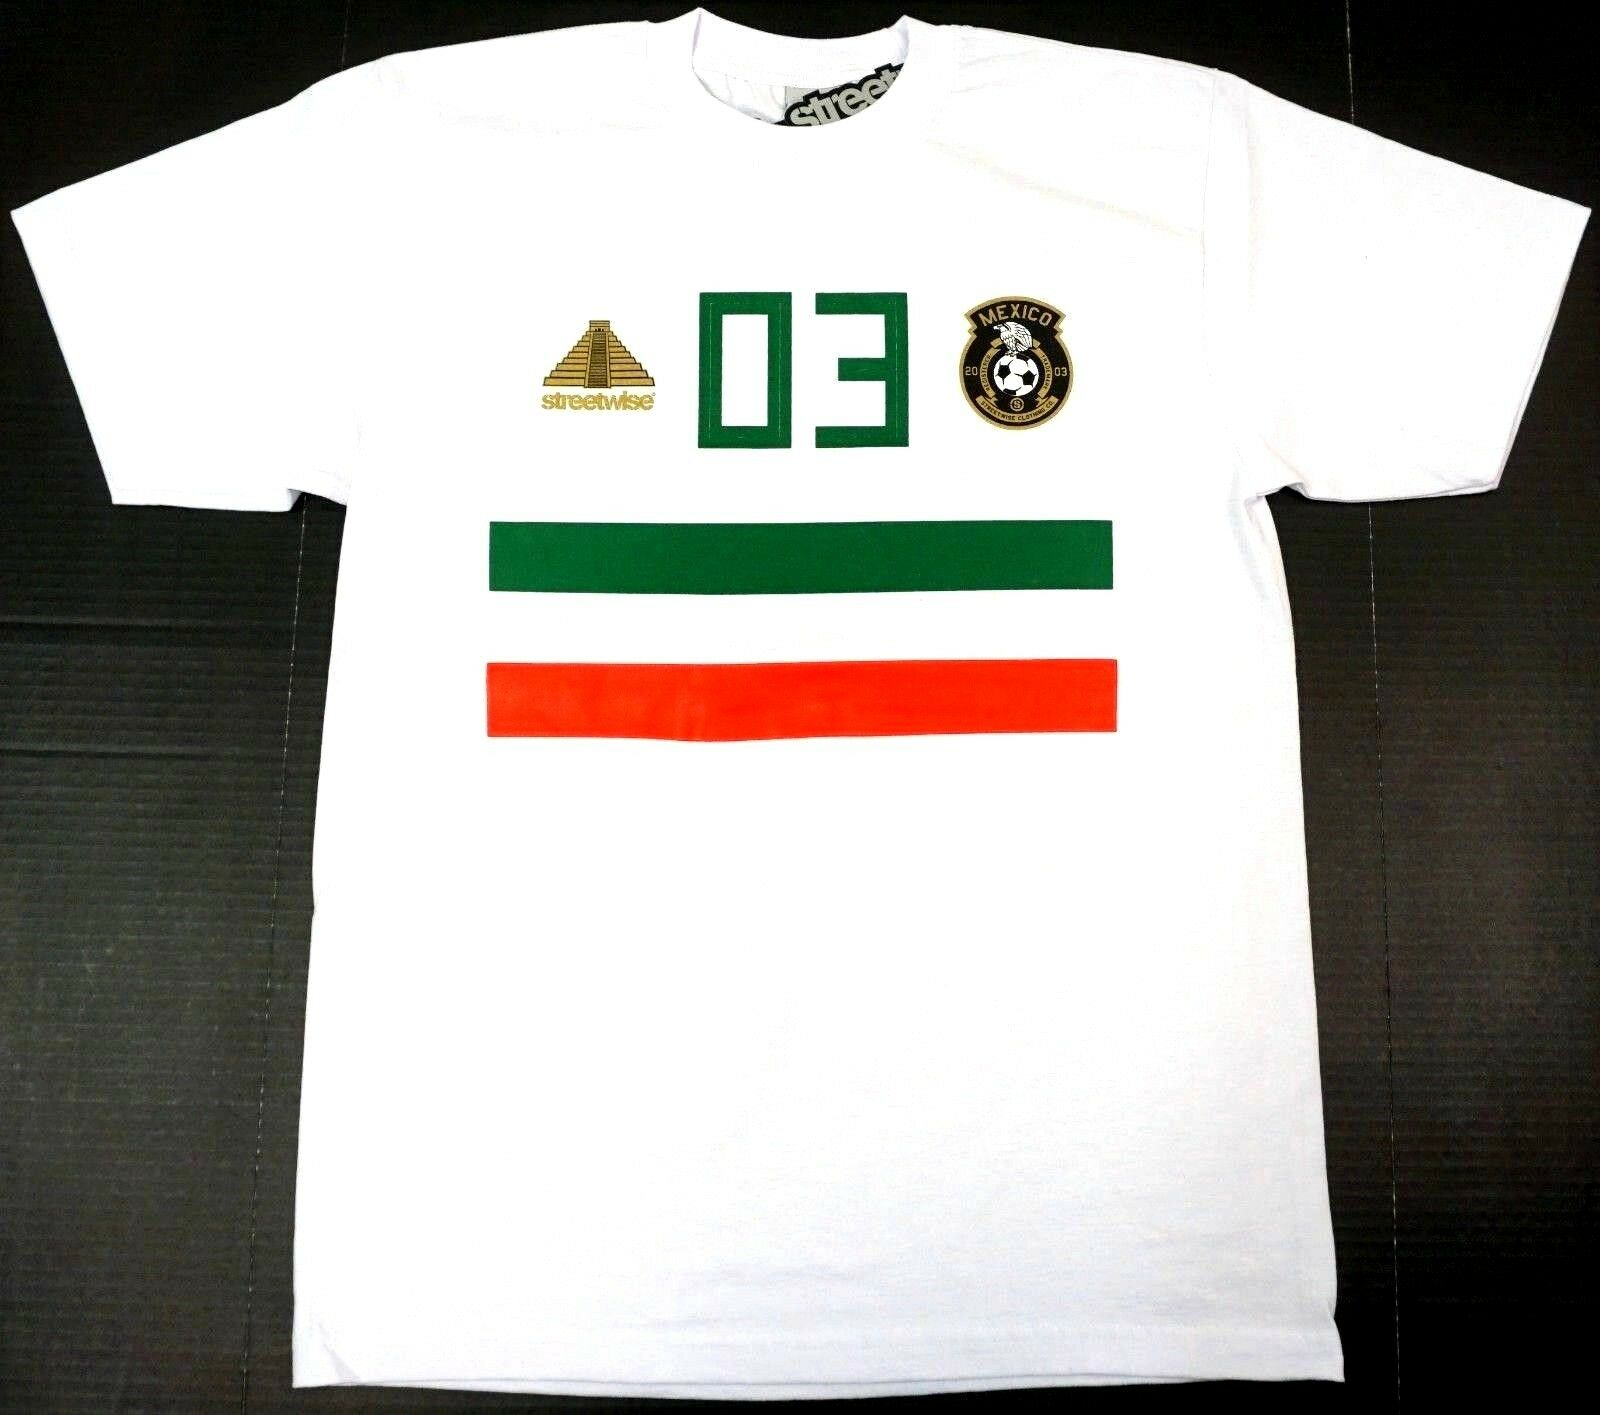 STREETWISE OSCURA T-shirt Streetwear Tee Men L-4XL Burgundy NWT Shirts Men's Clothing